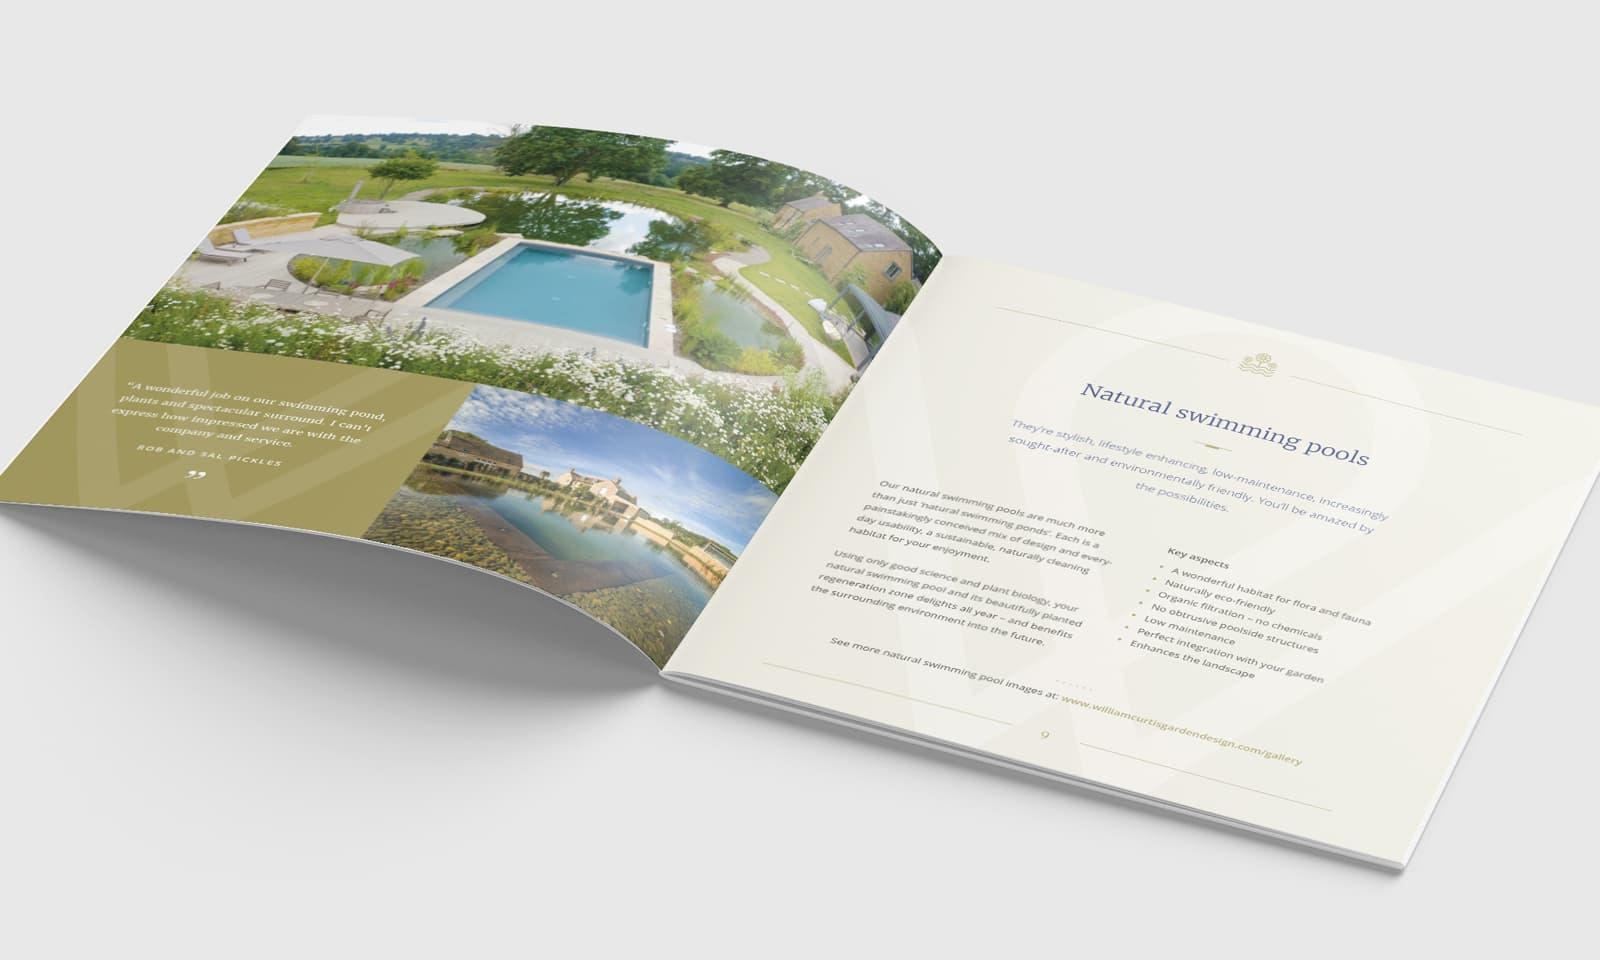 William Curtis Natural Swimming Pools